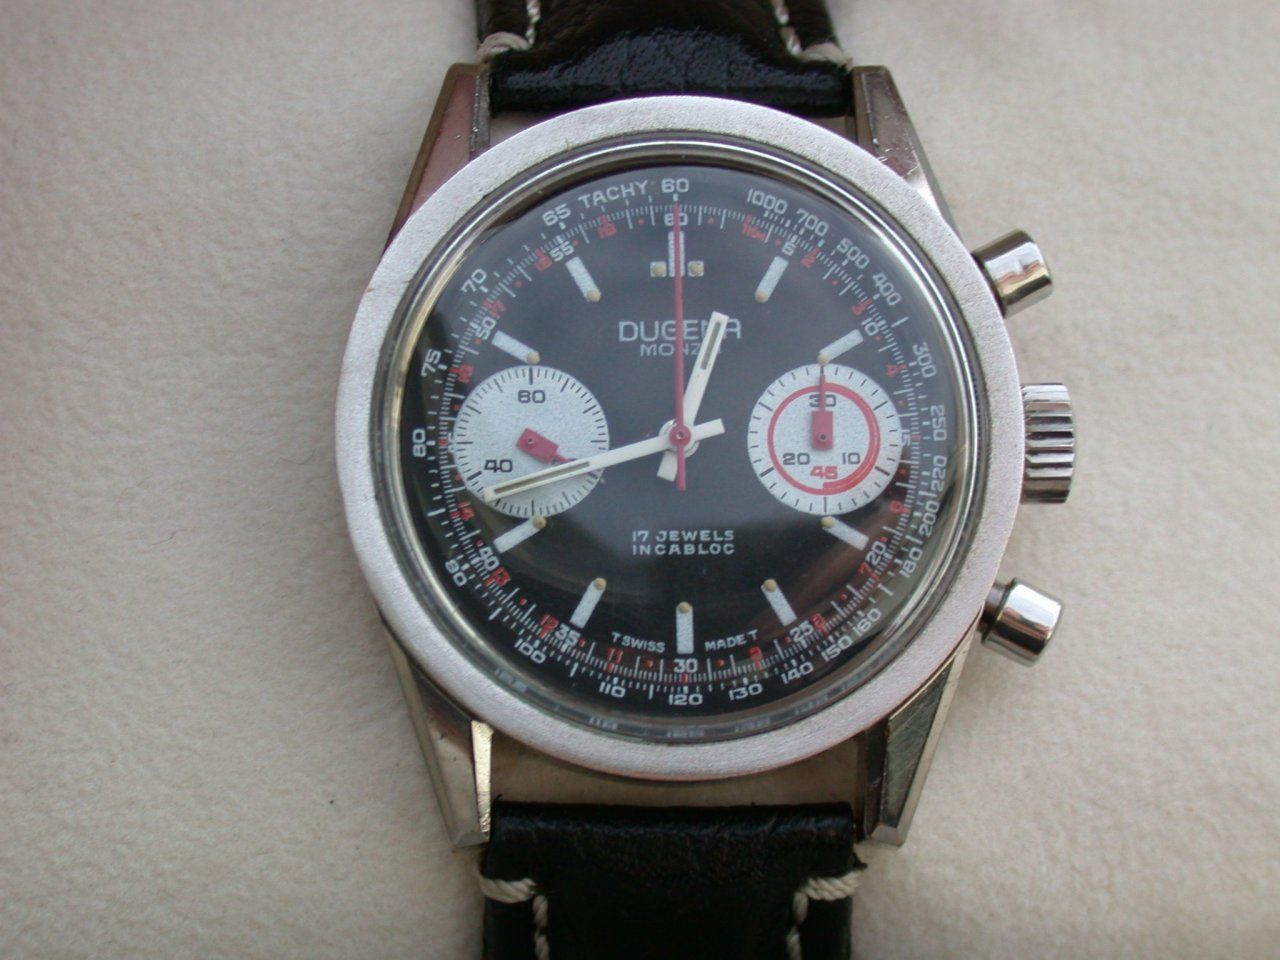 Erledigt] DUGENA MONZA Vintage- Chronograph